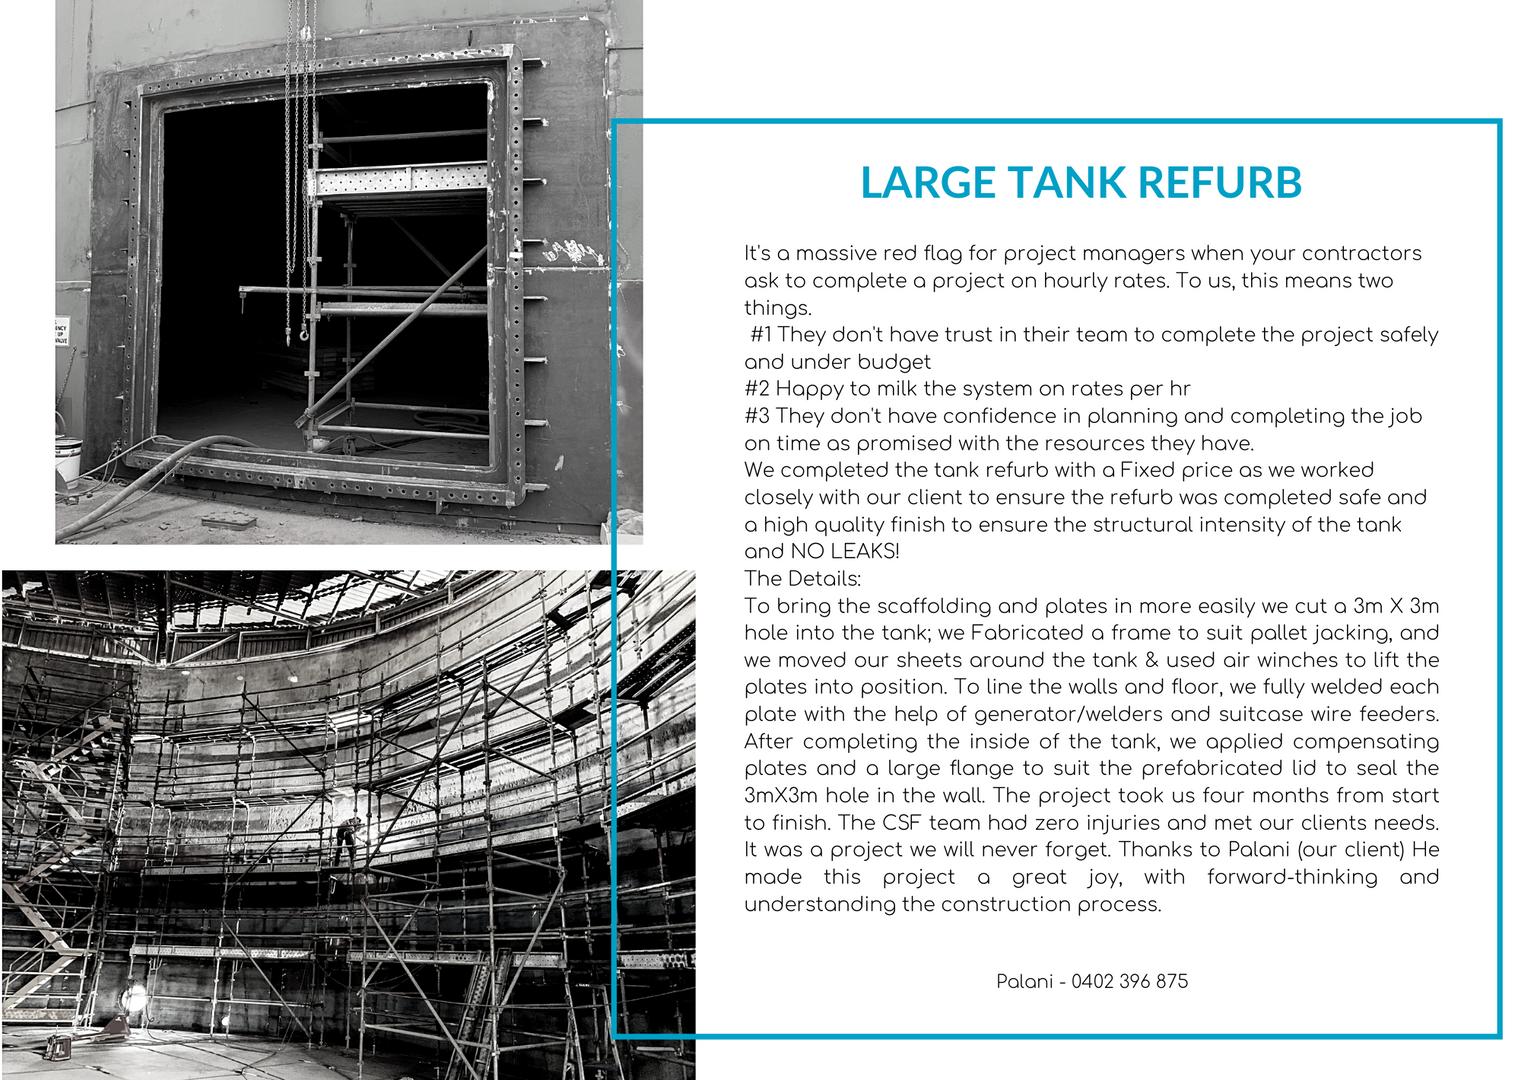 Large tank refurb